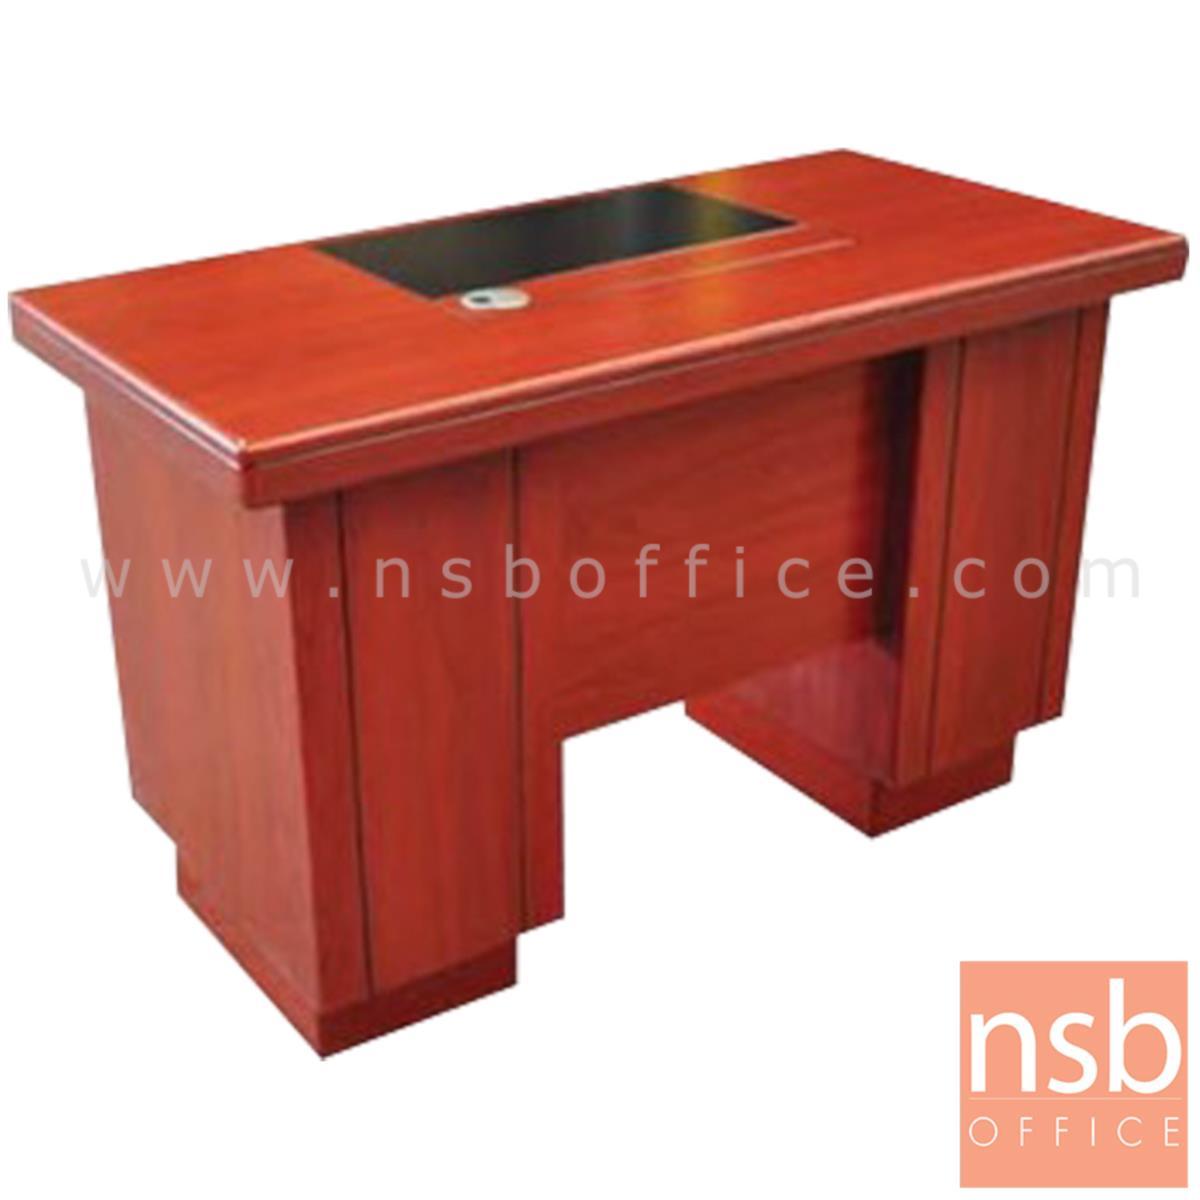 A06A143:โต๊ะผู้บริหาร รุ่น NIZHNY (นิจนี) ขนาด 140W cm.